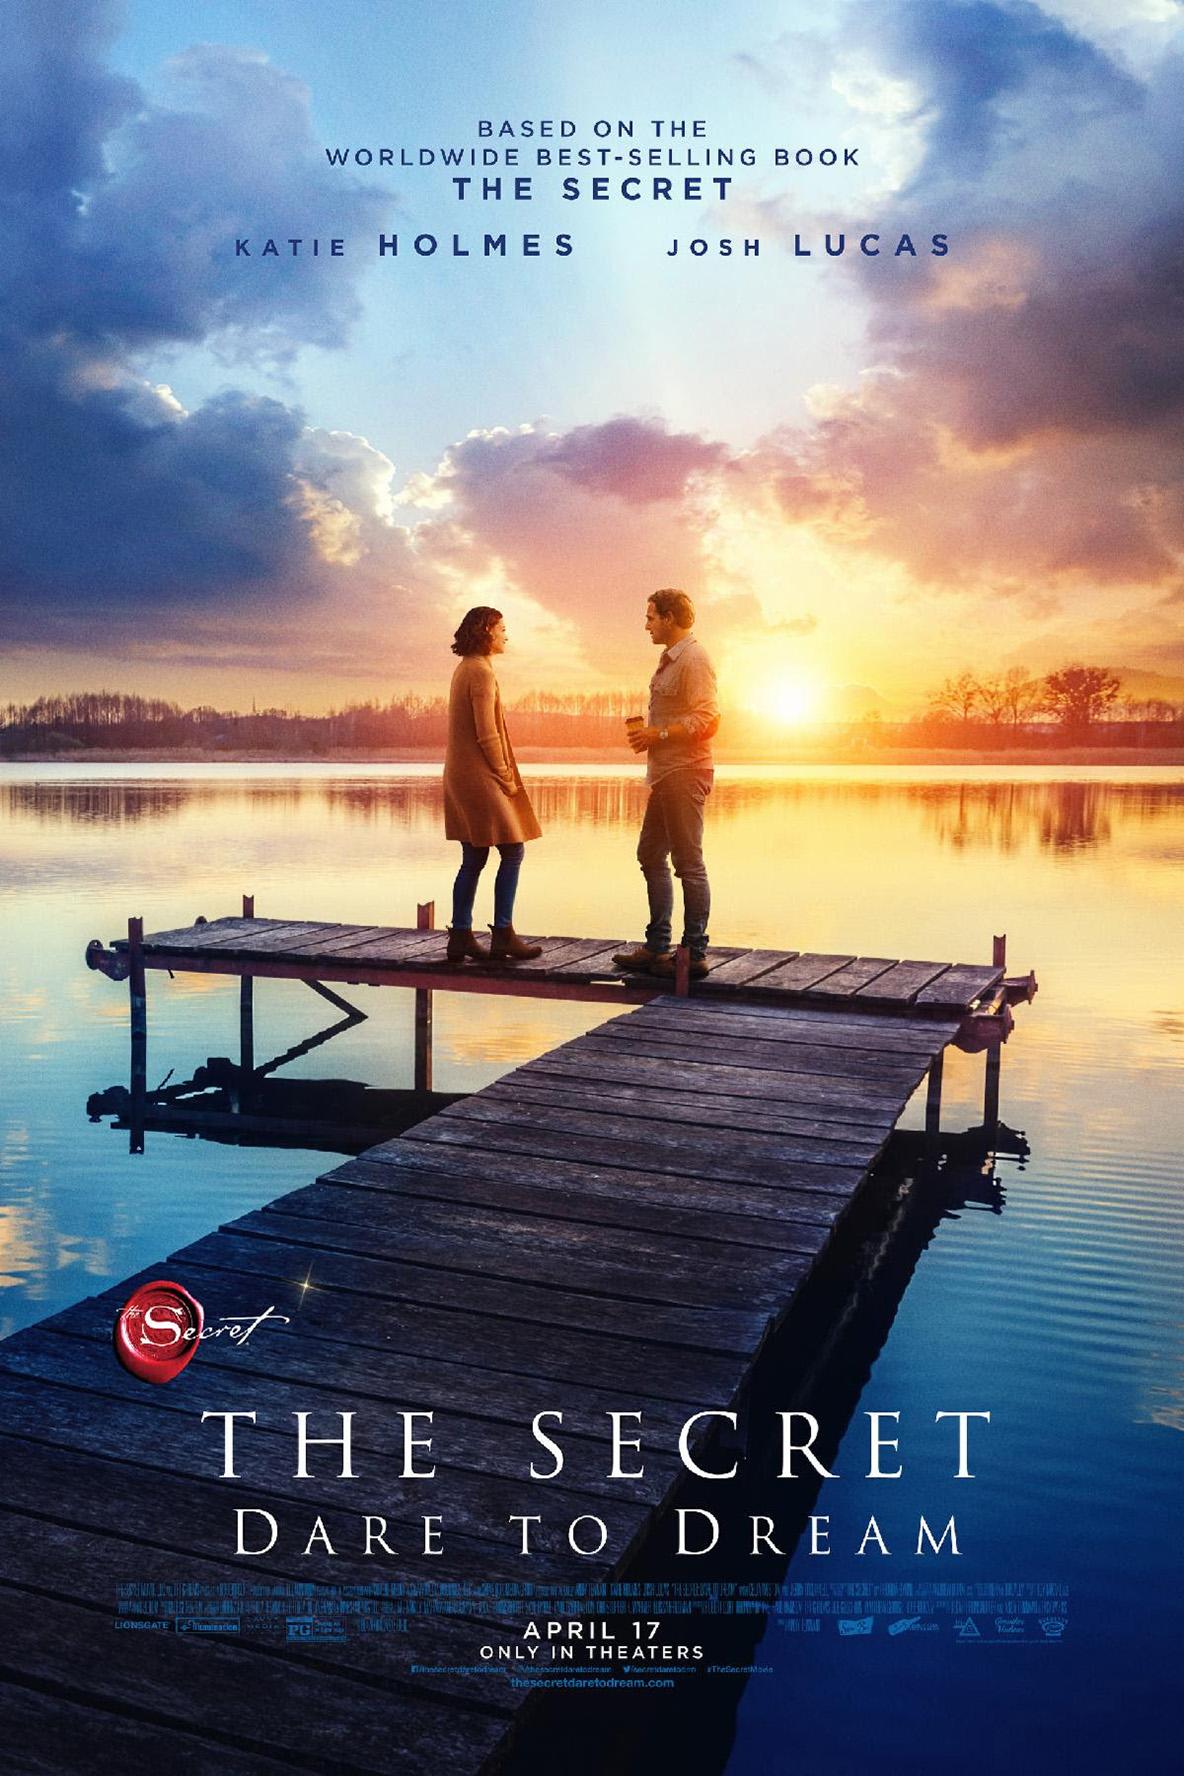 The Secret: Dare To Dream At An AMC Theatre Near You